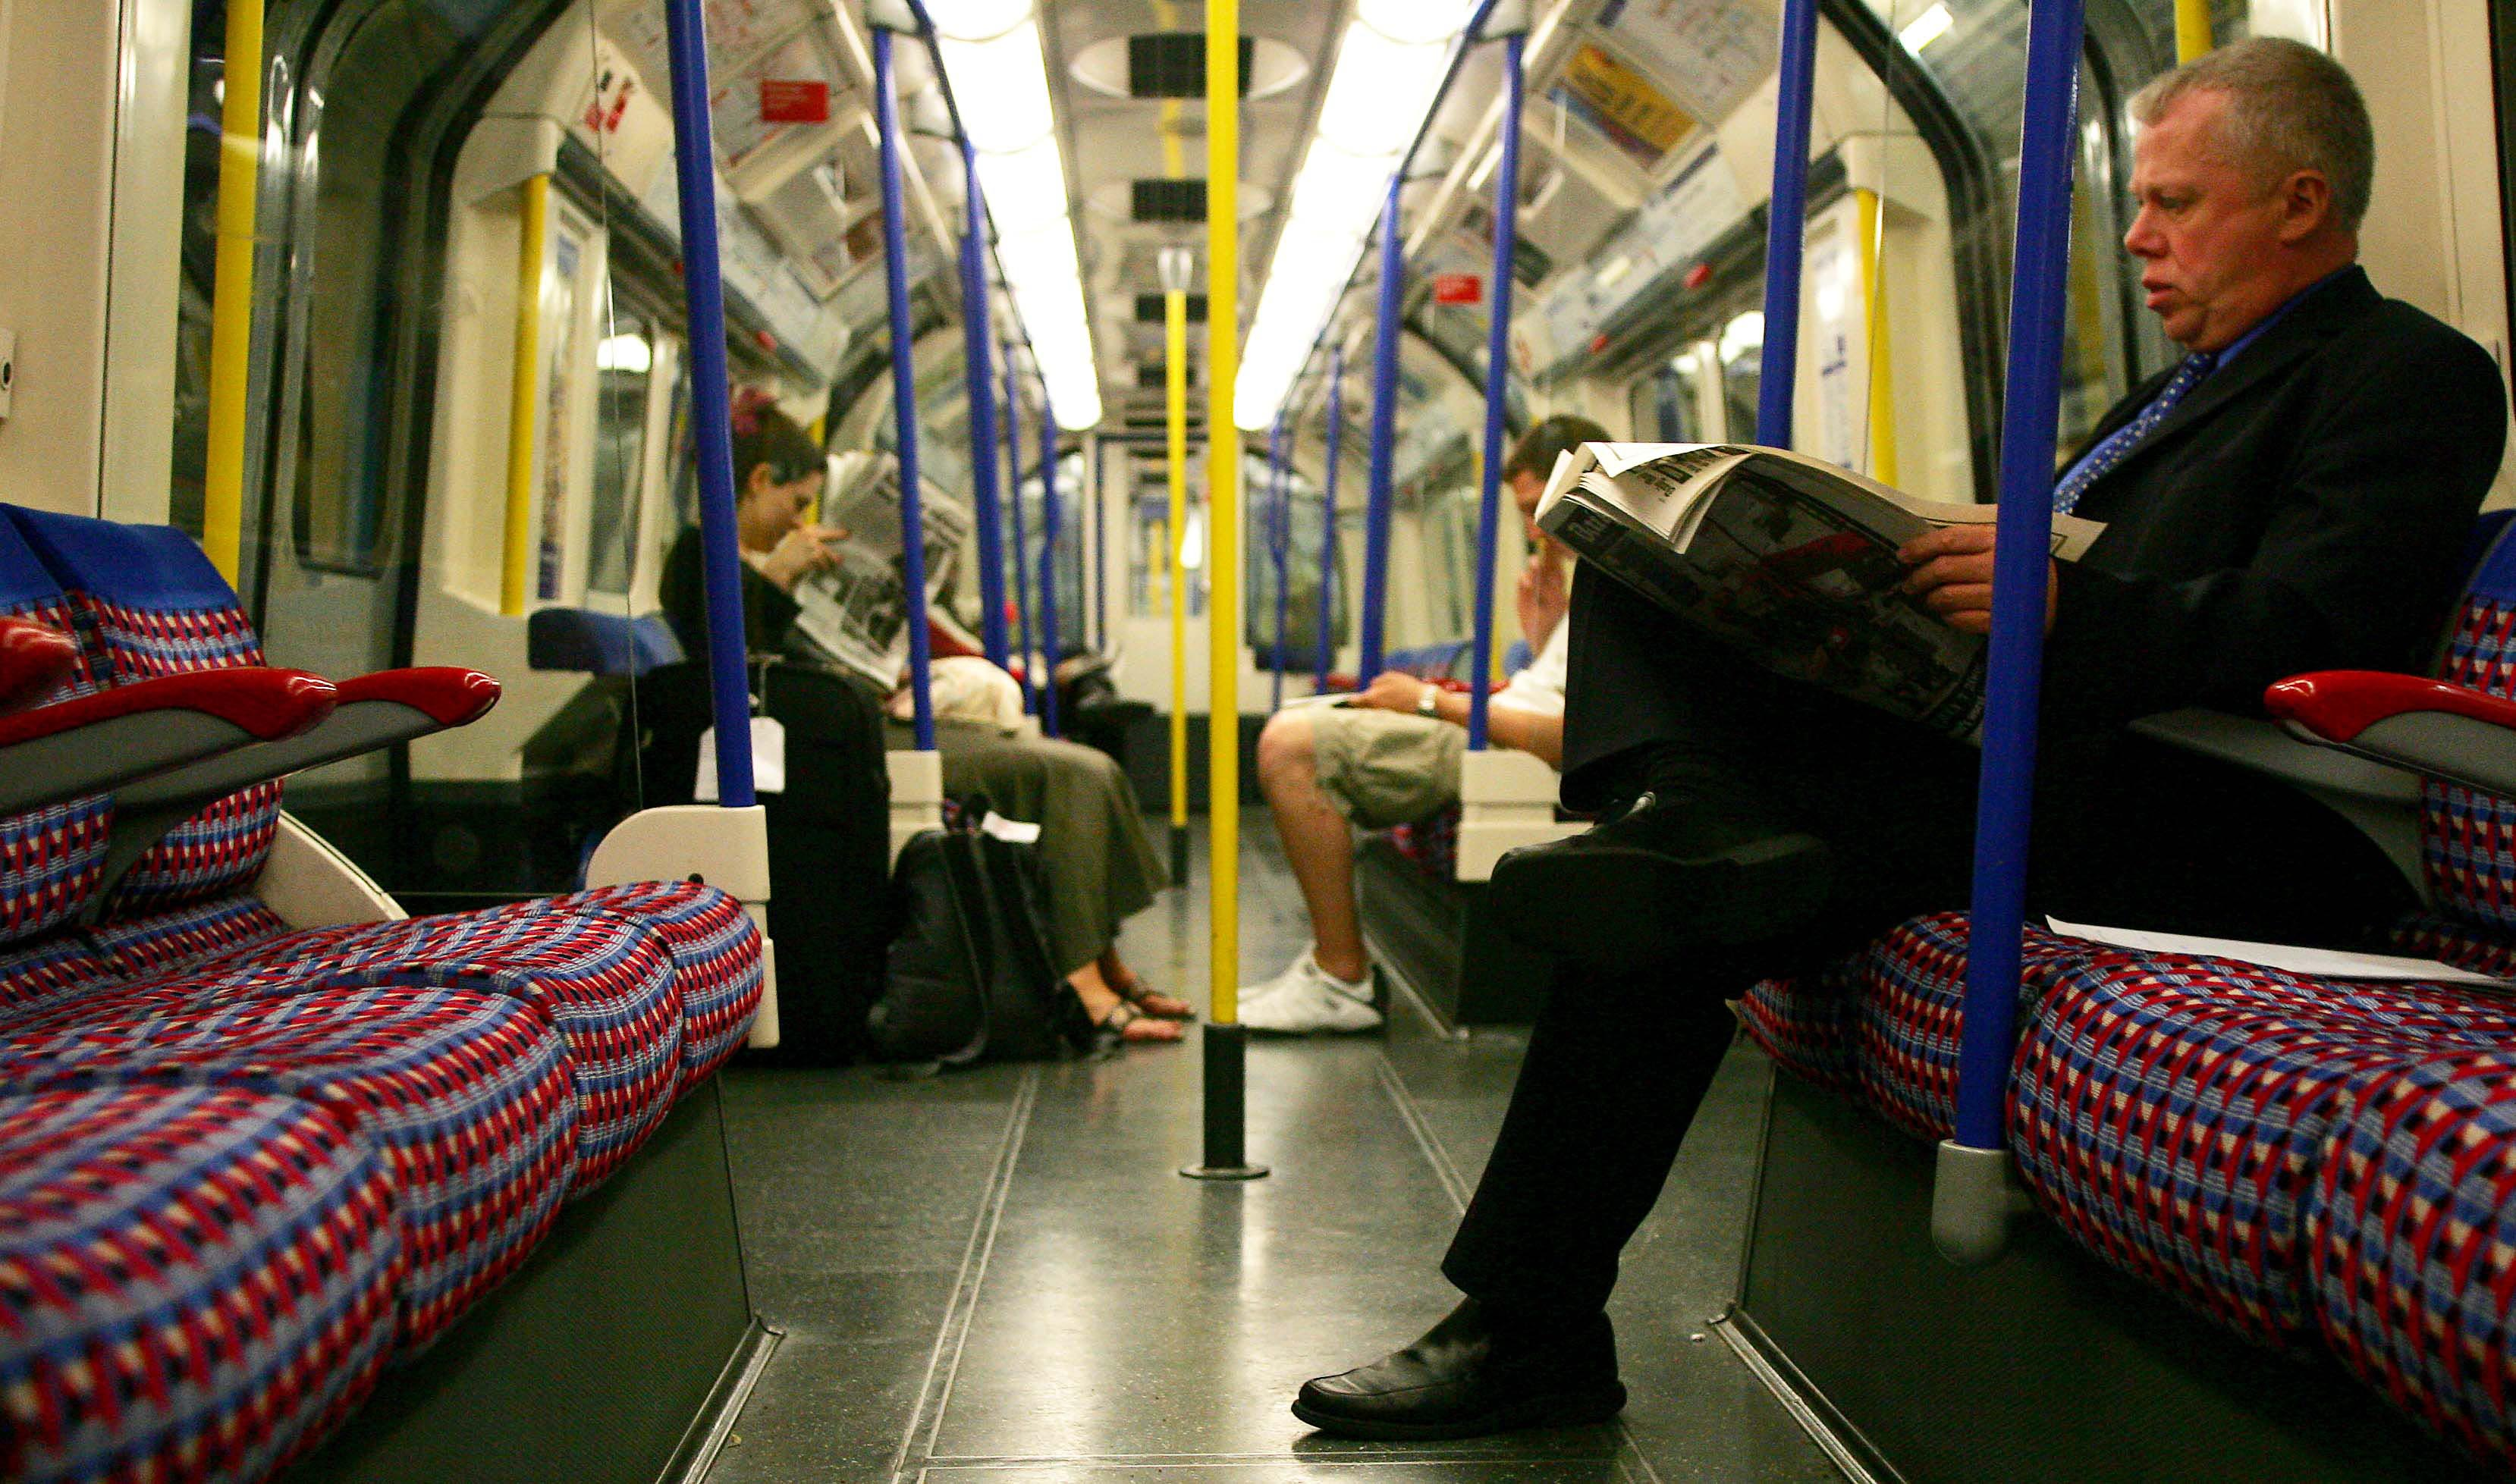 Passengers travel on the London Underground, July 8, 2005.